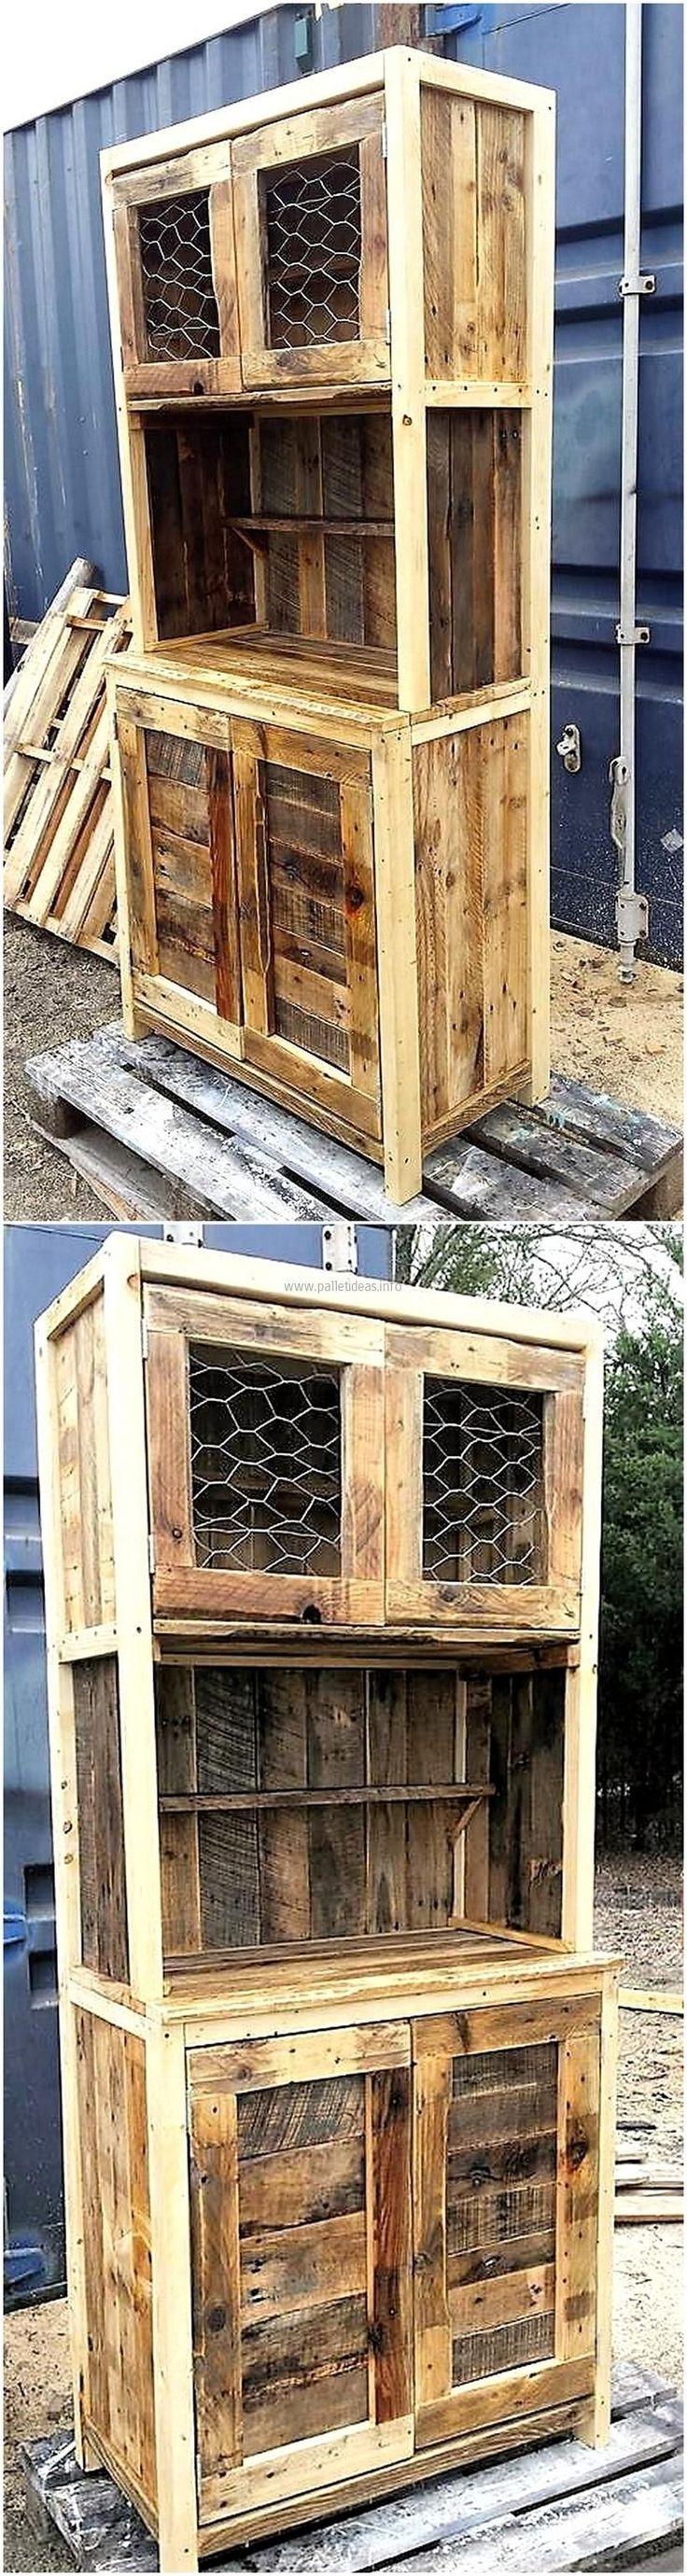 pallet rustic storage cabinet